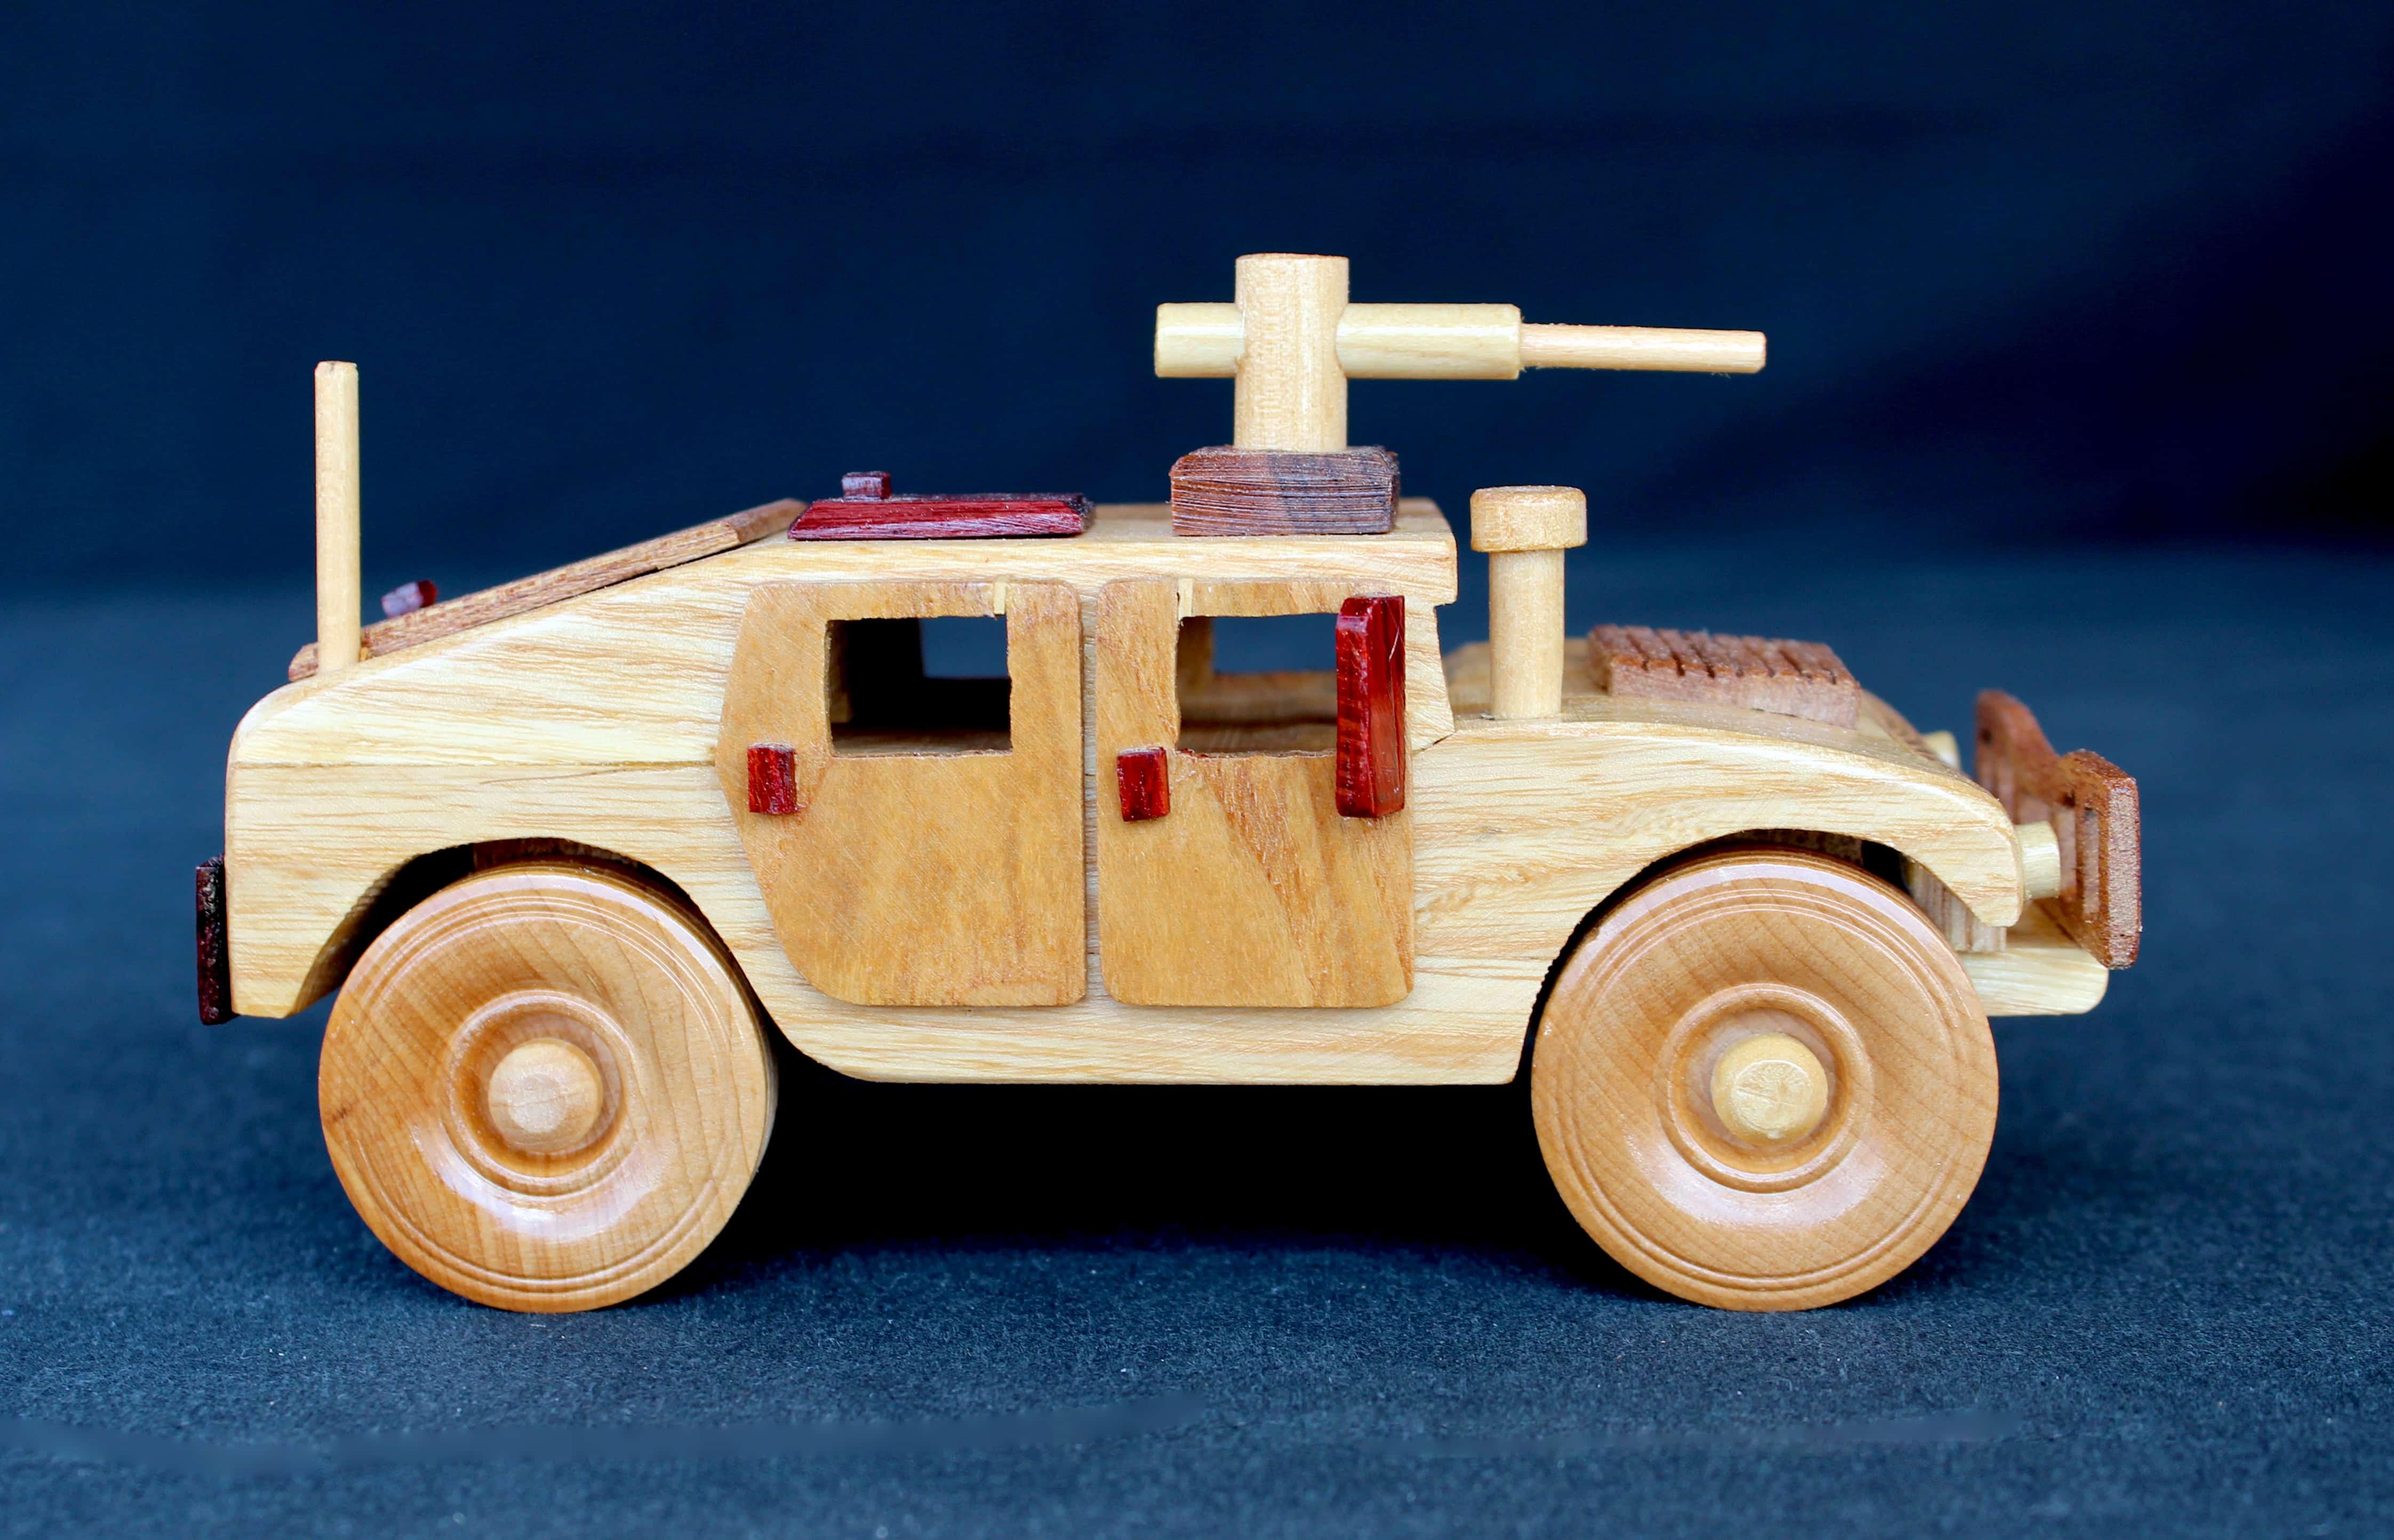 Humvee woodworking plan from the Plump'N'Tuff plan set